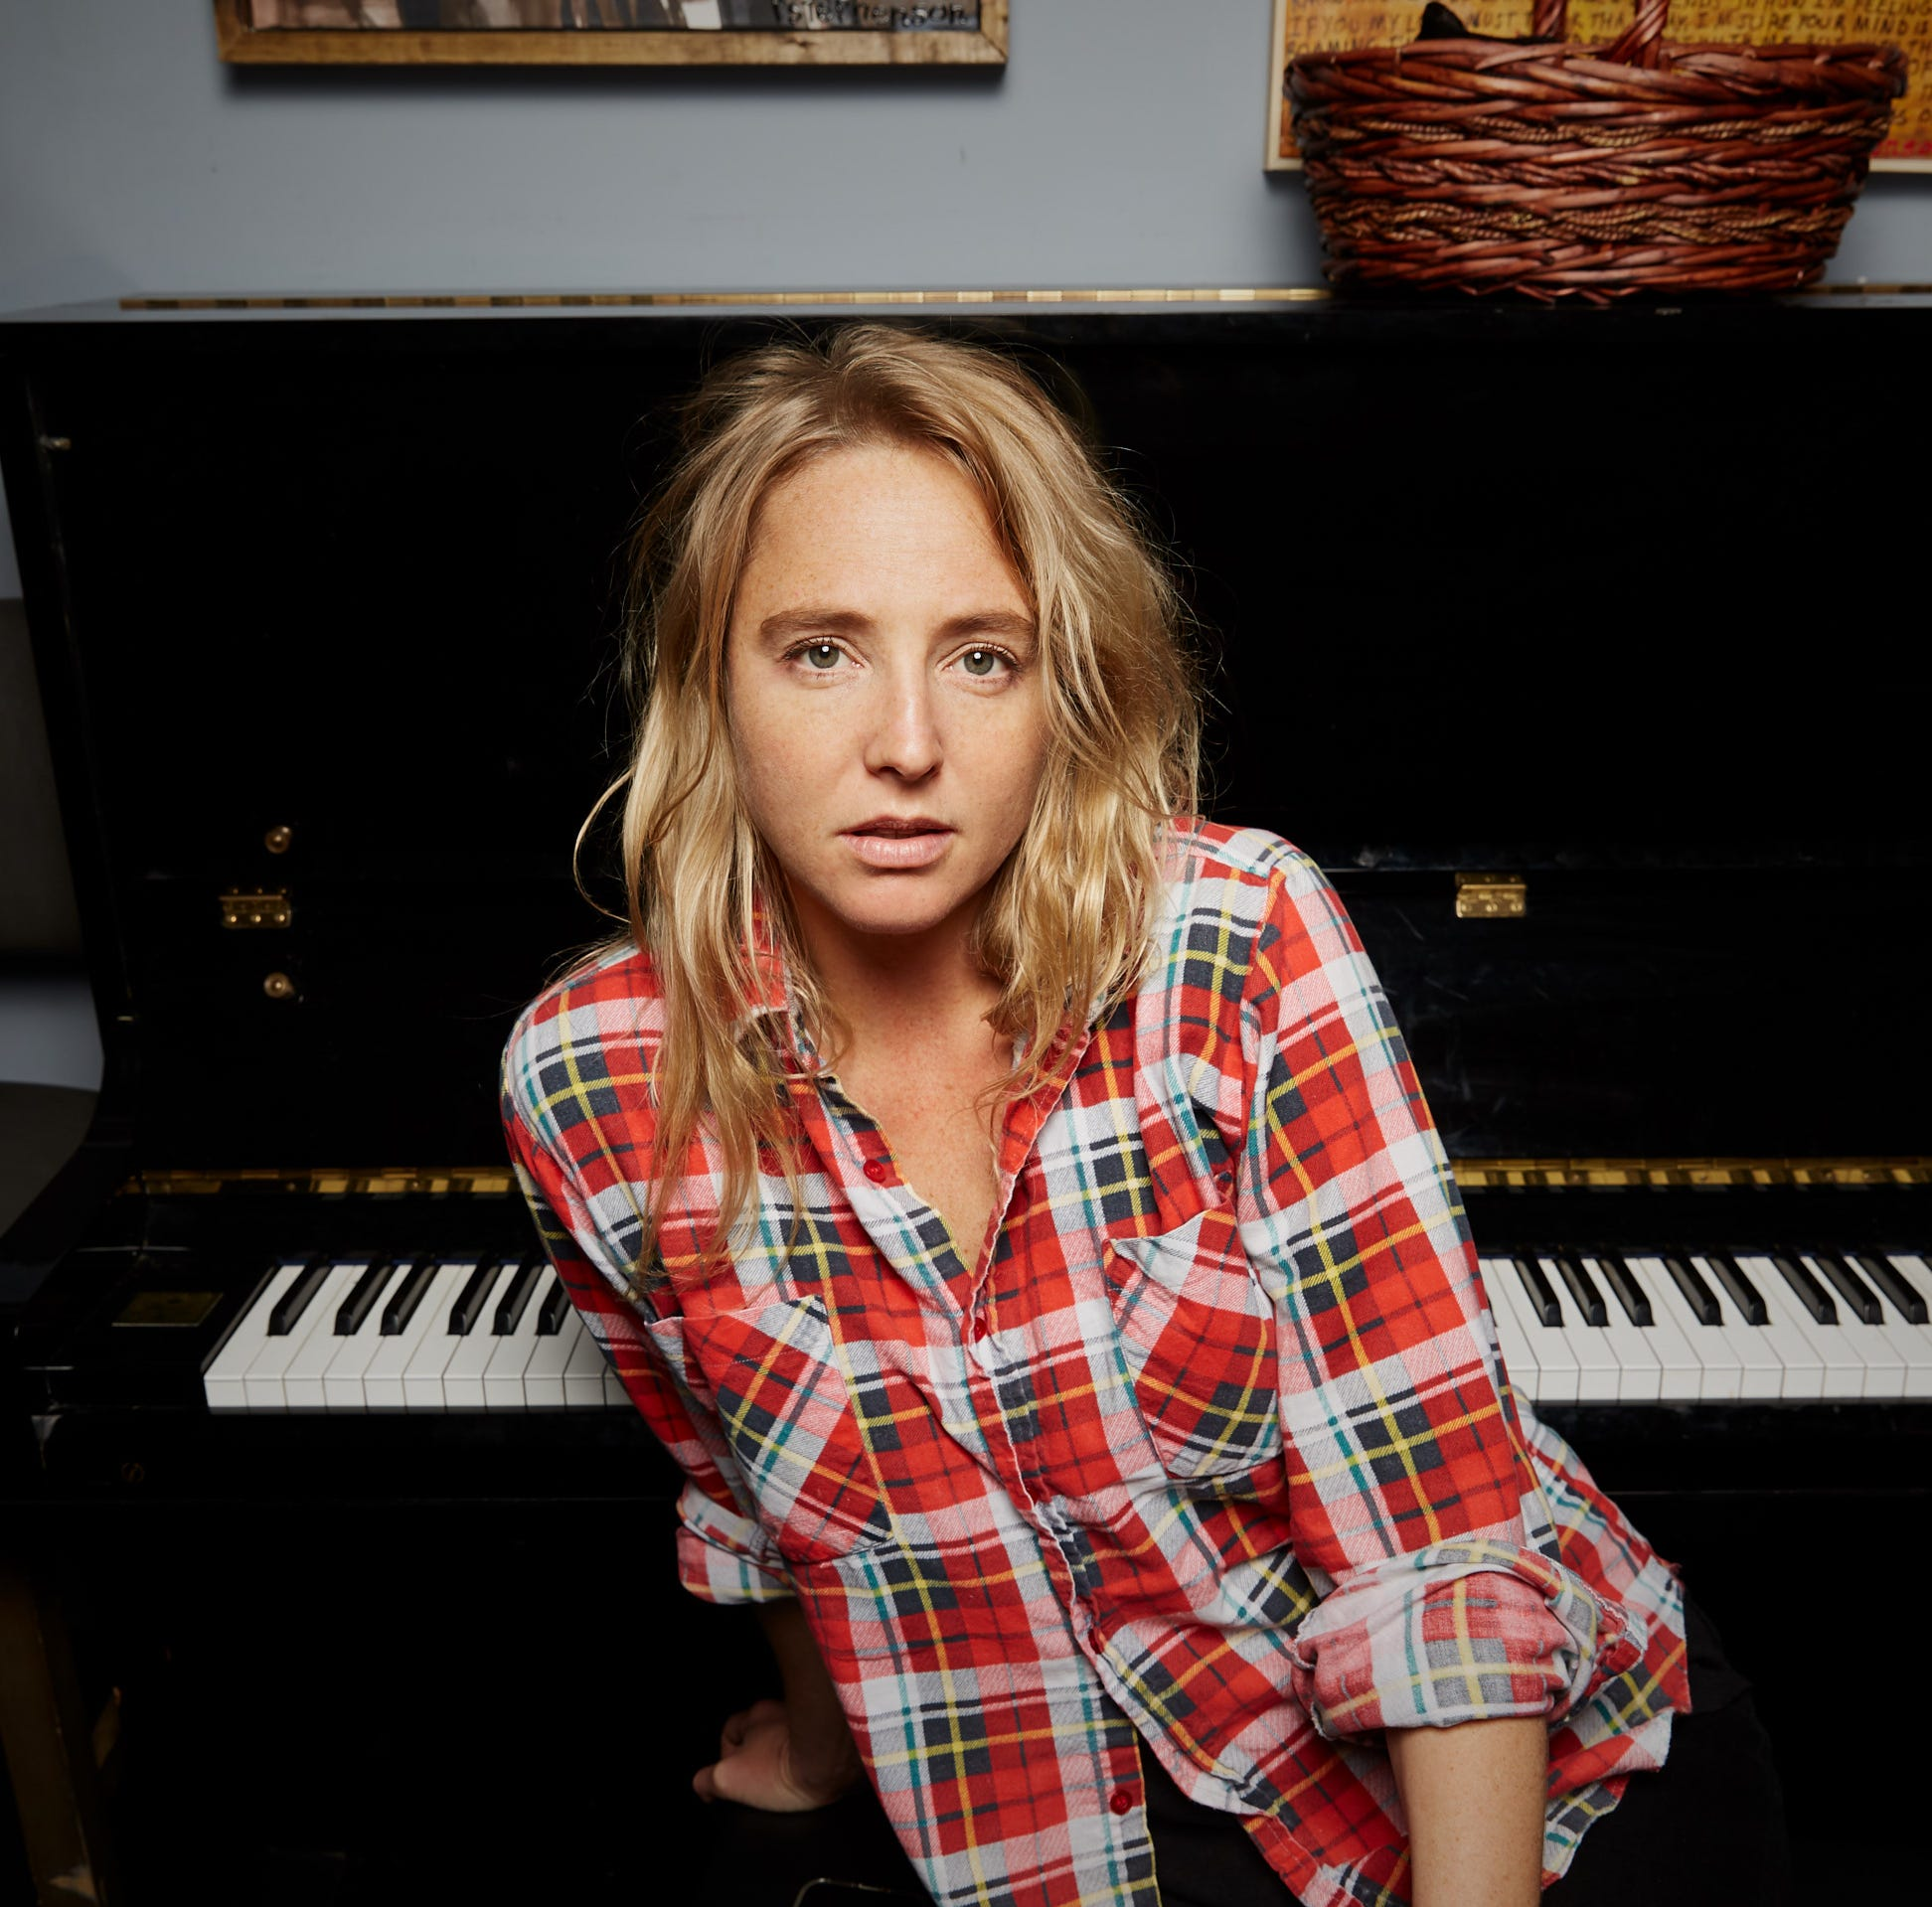 Listen: An Iowa artist released a must-hear Fleetwood Mac cover